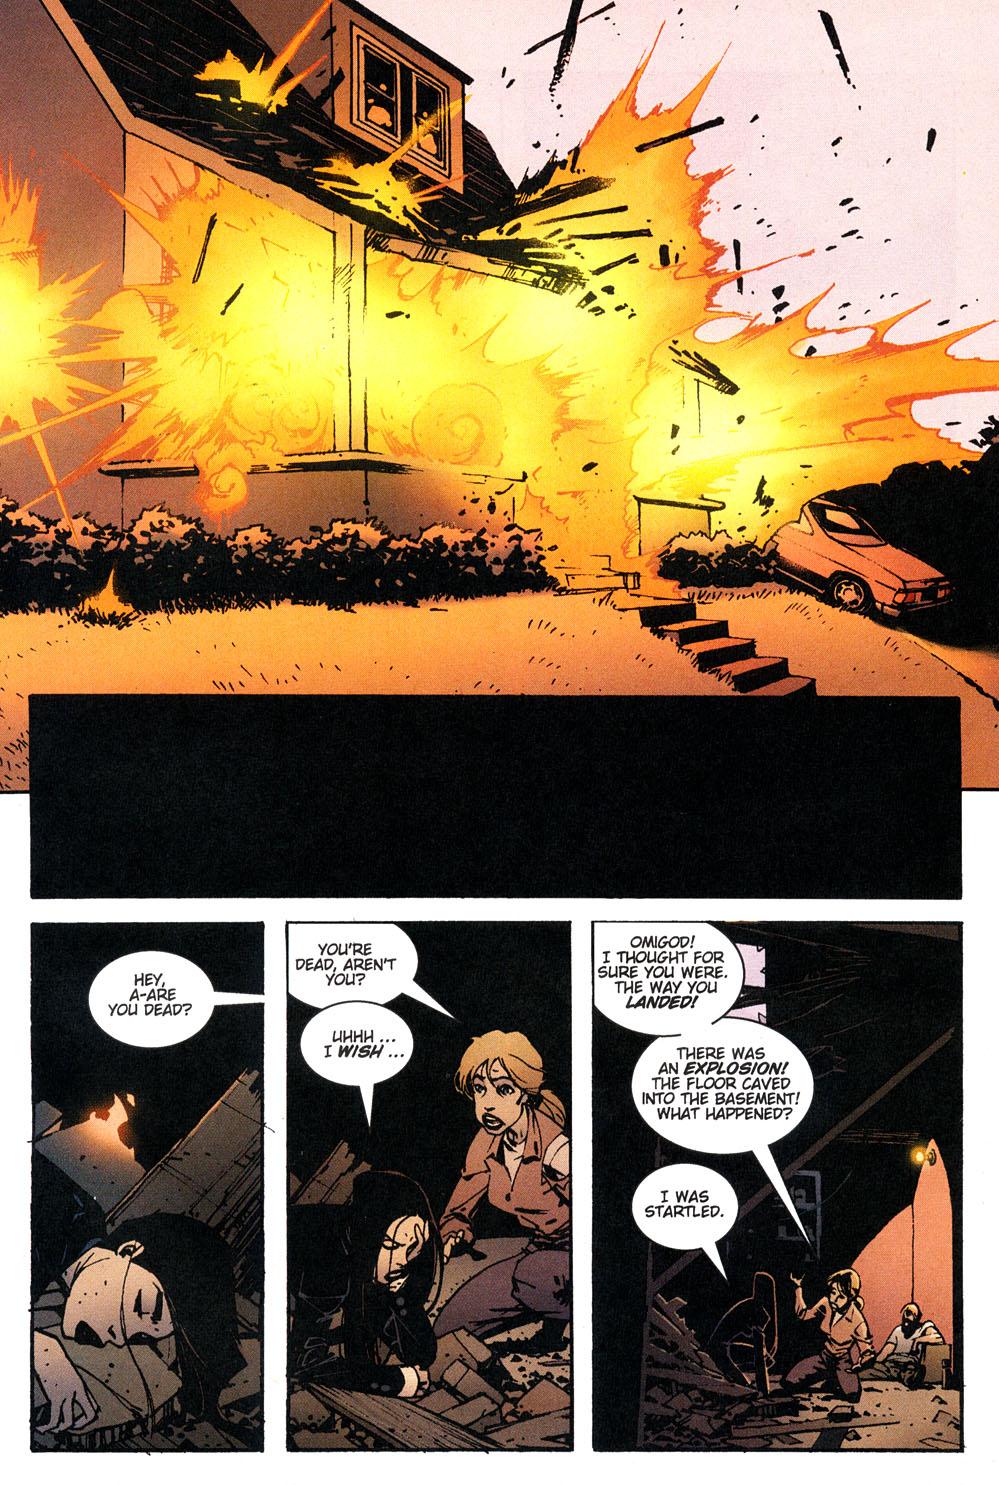 Read online Hellboy: Weird Tales comic -  Issue #4 - 9